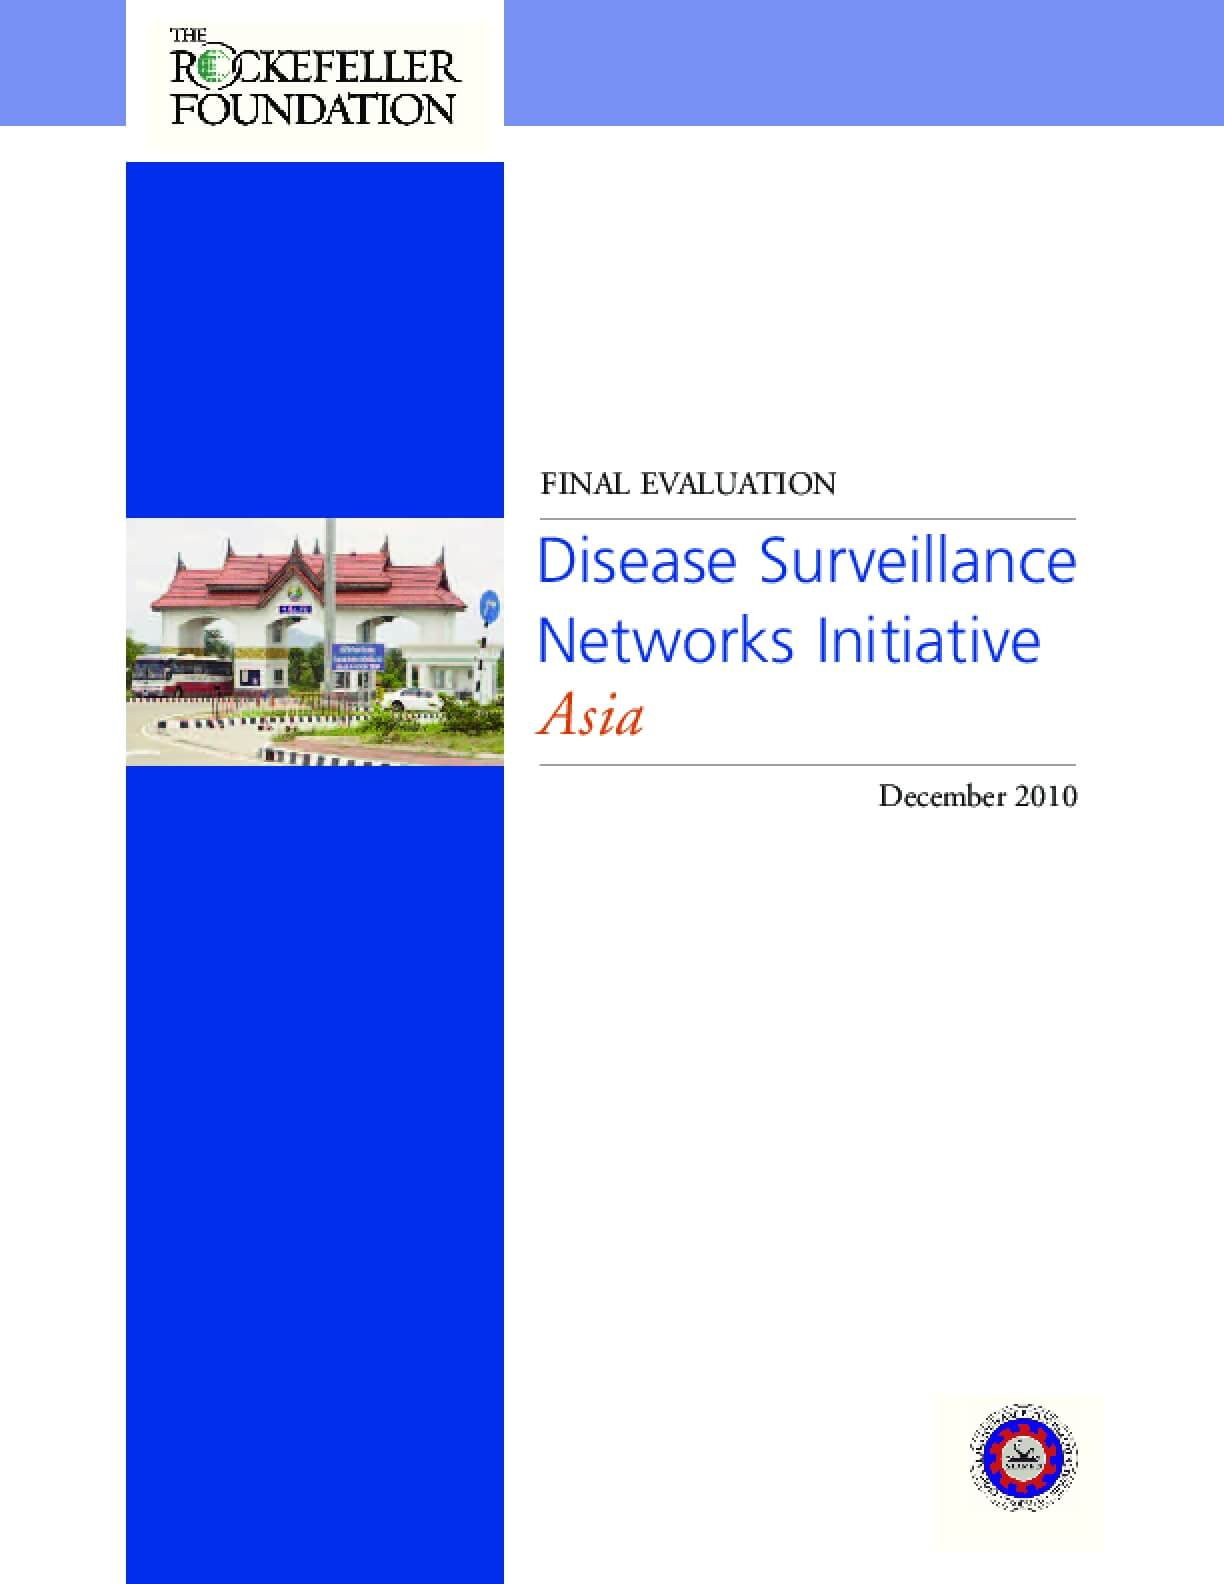 Disease Surveillance Networks Initiative Asia: Final Evaluation